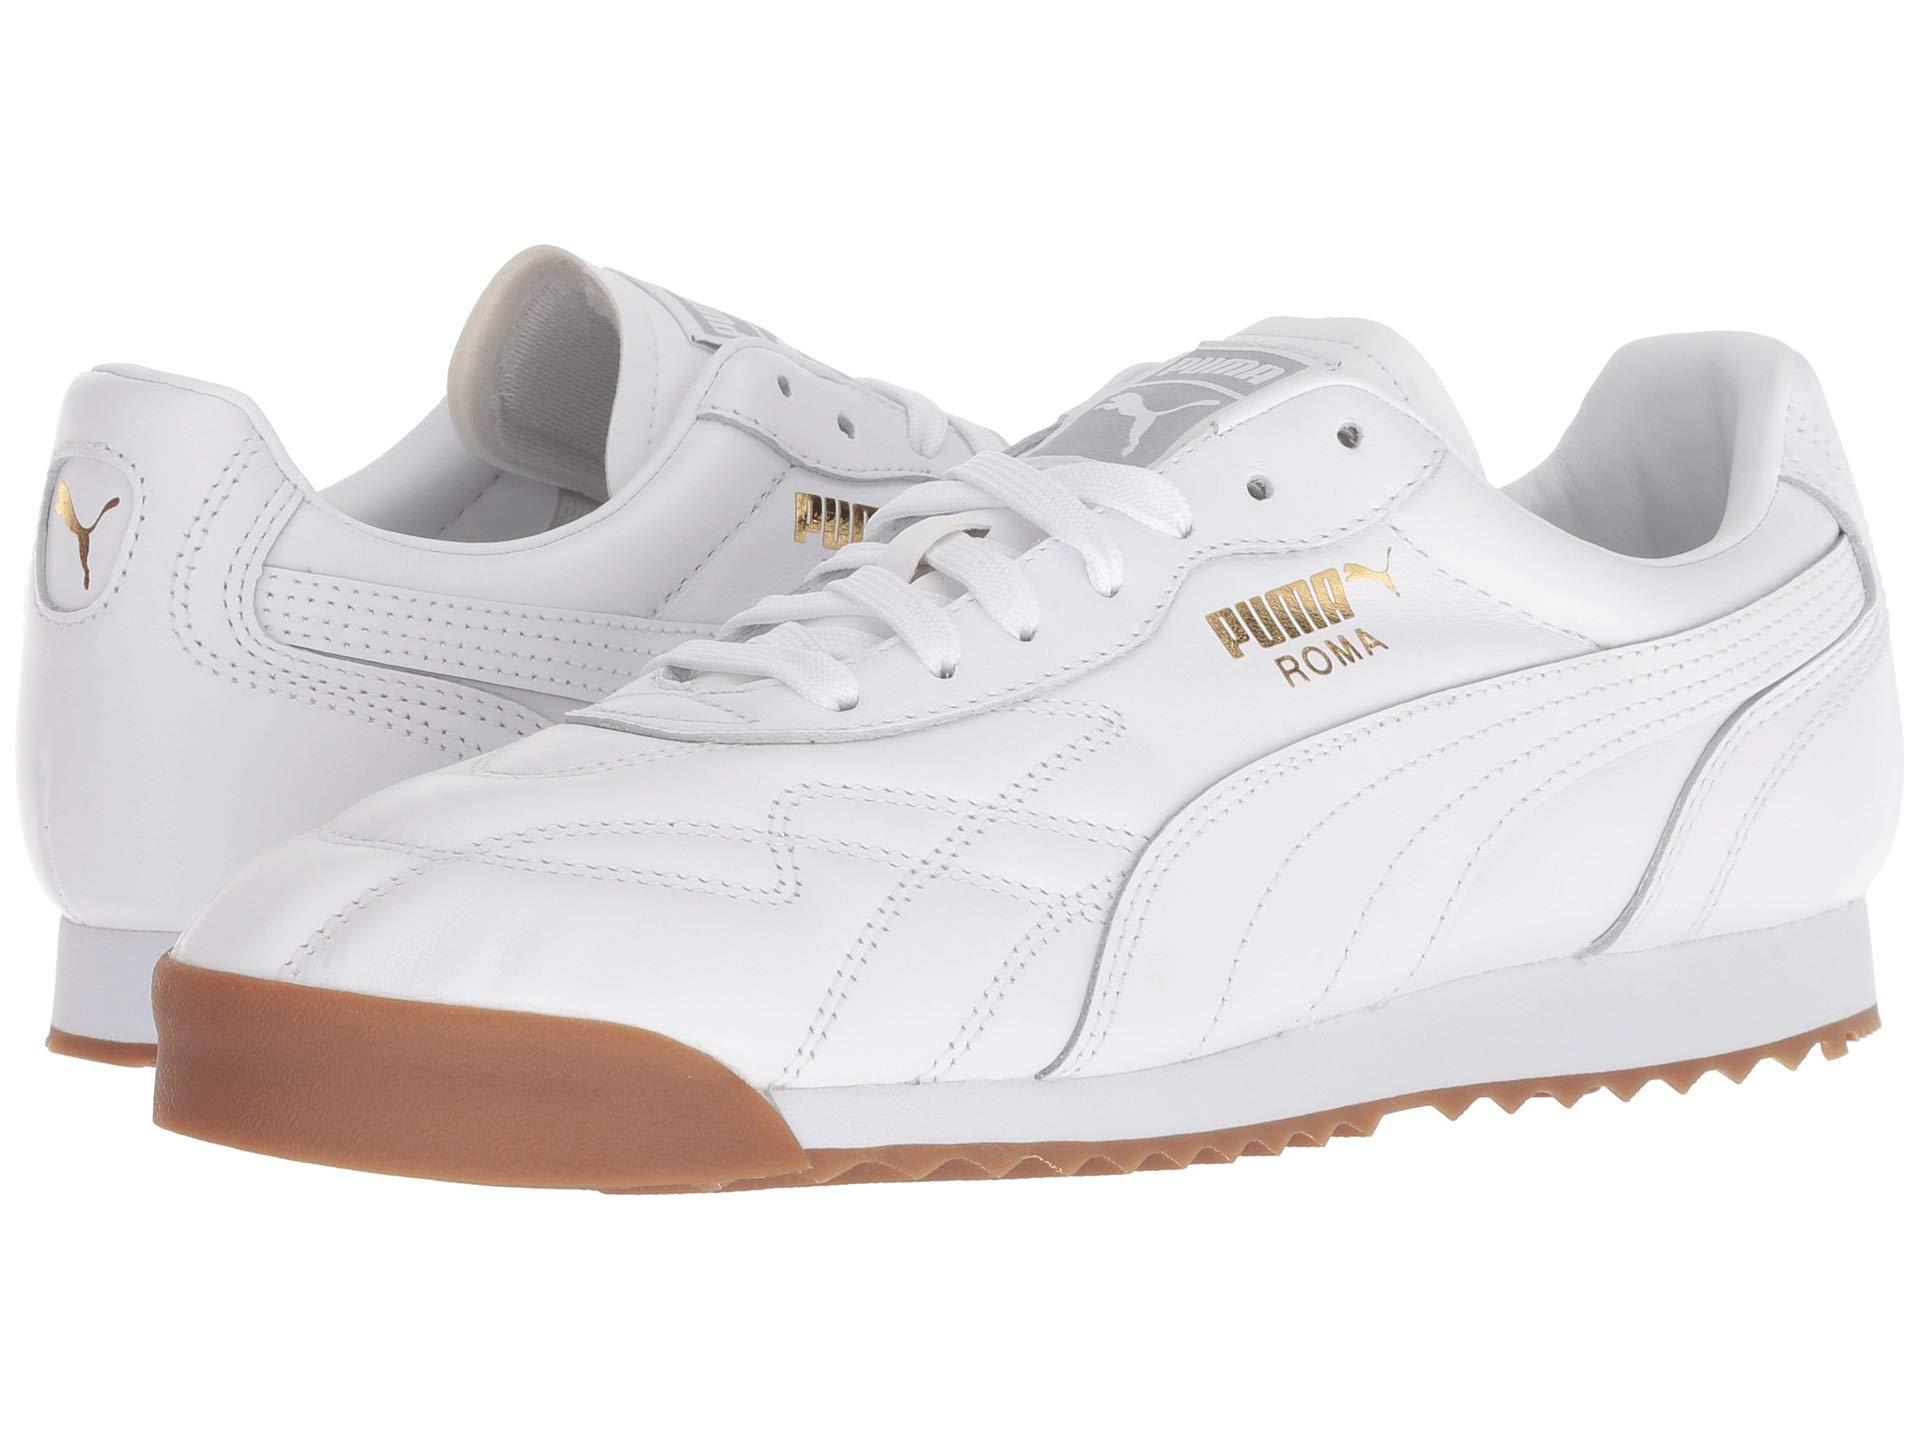 Roma puma White White Puma Anniversario FPnadx0